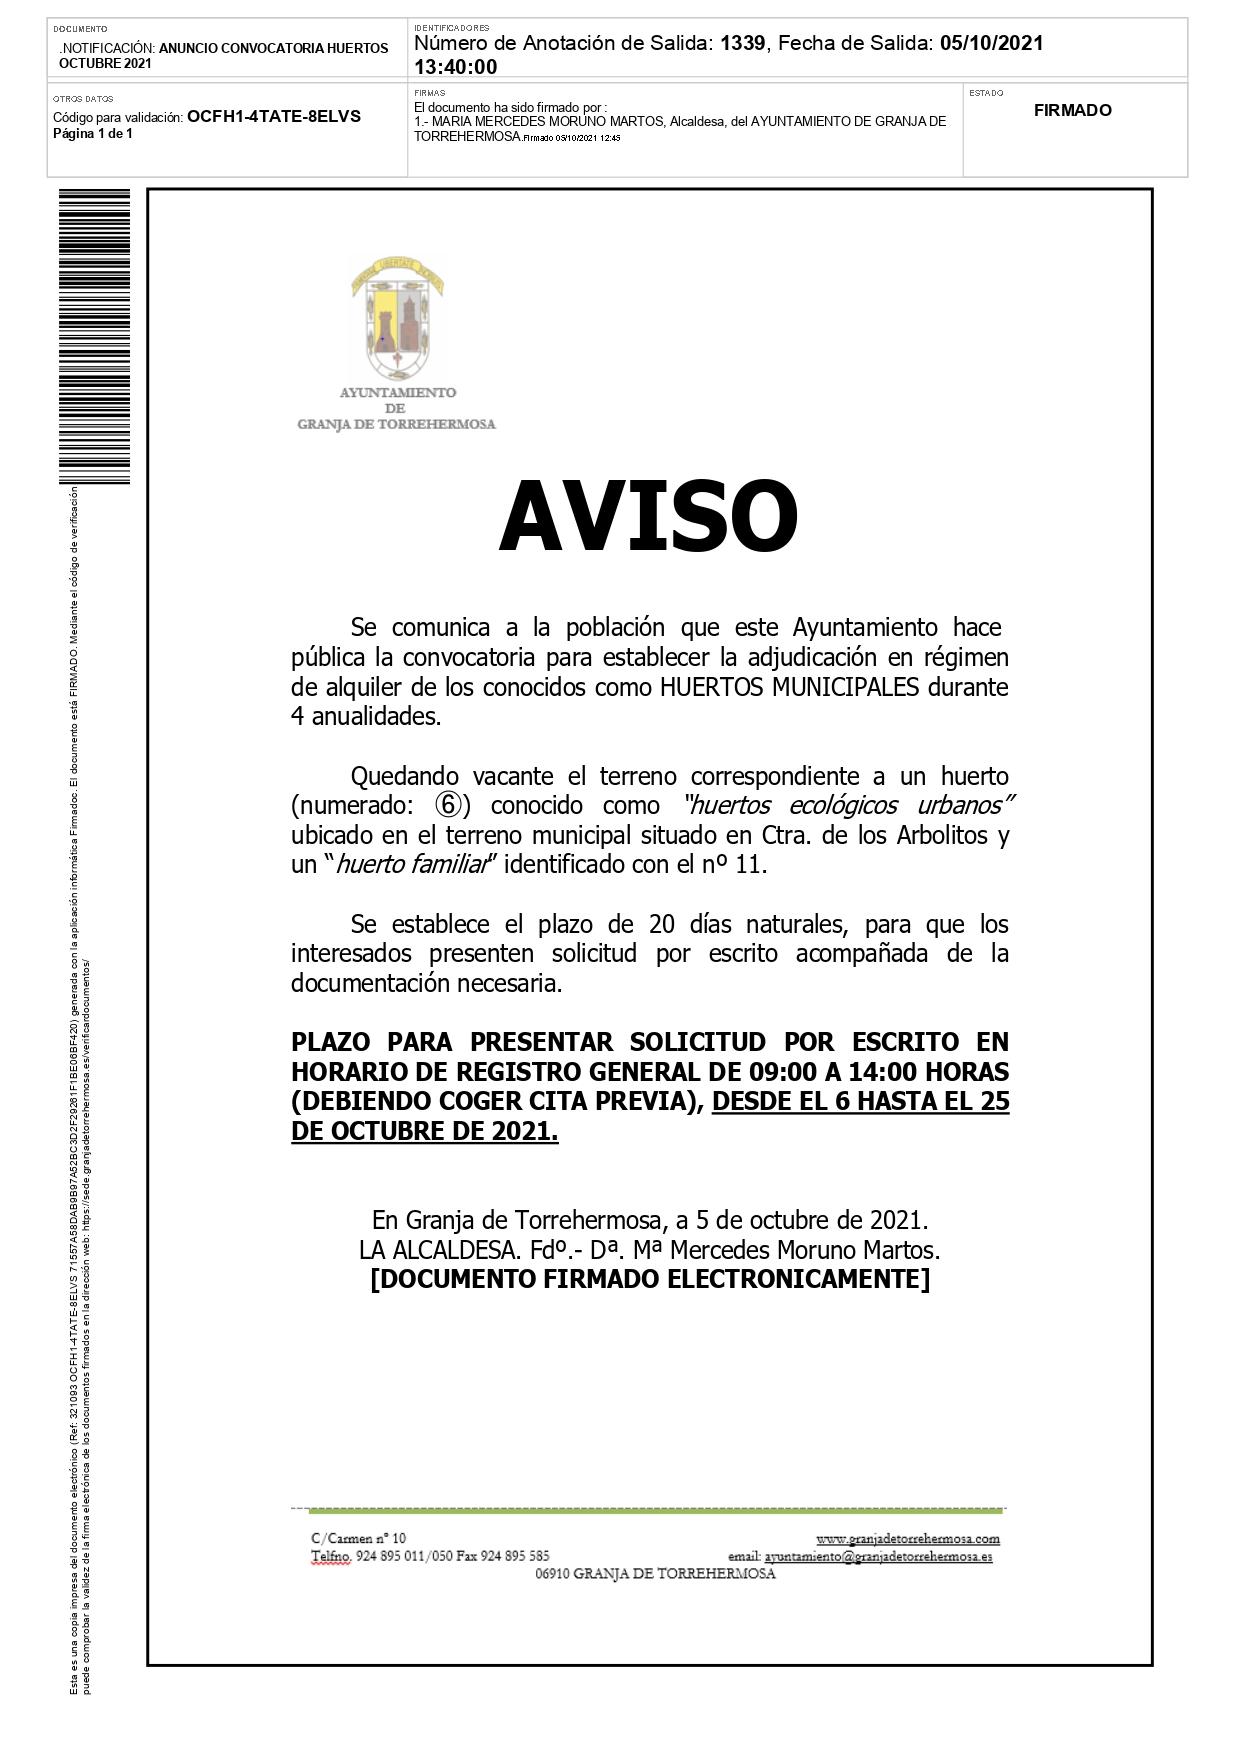 HUERTOS MUNICIPALES